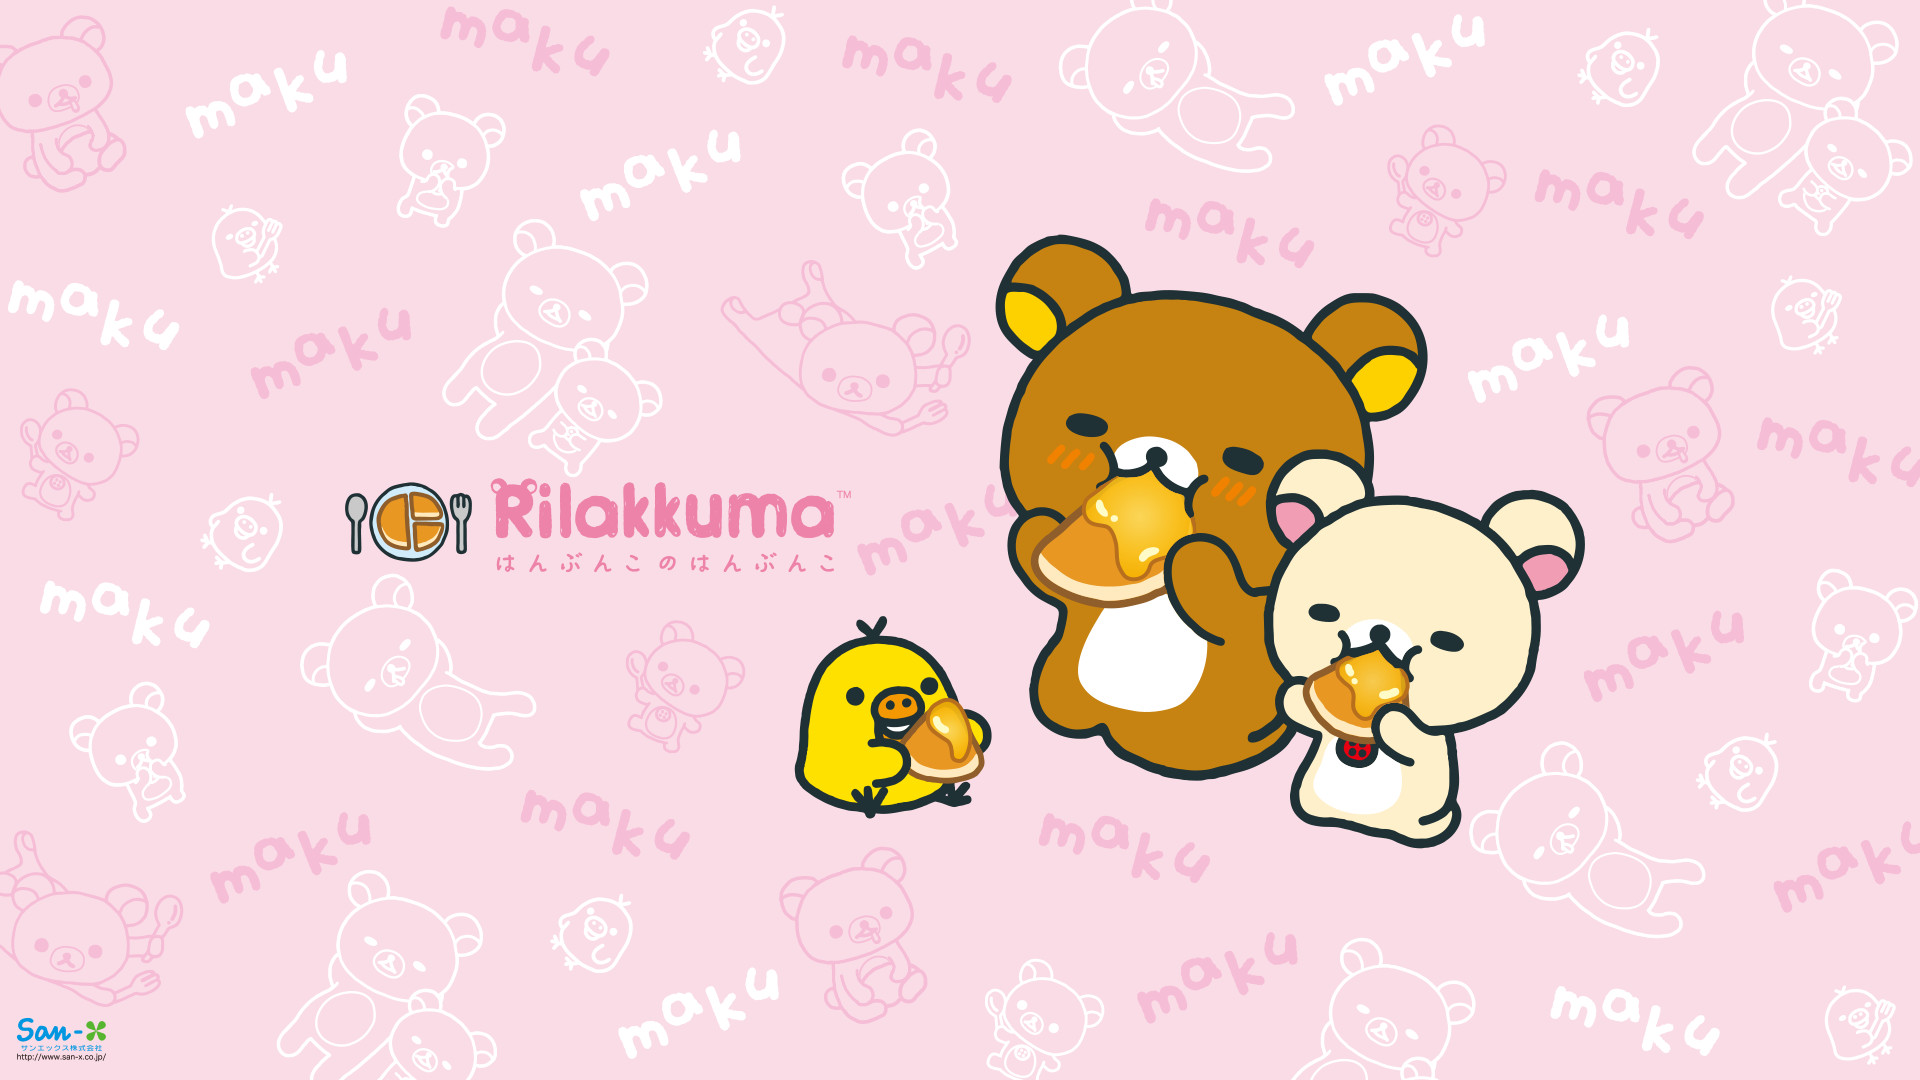 All about Hello Kitty to Rilakkuma and every kawaii cuteness.